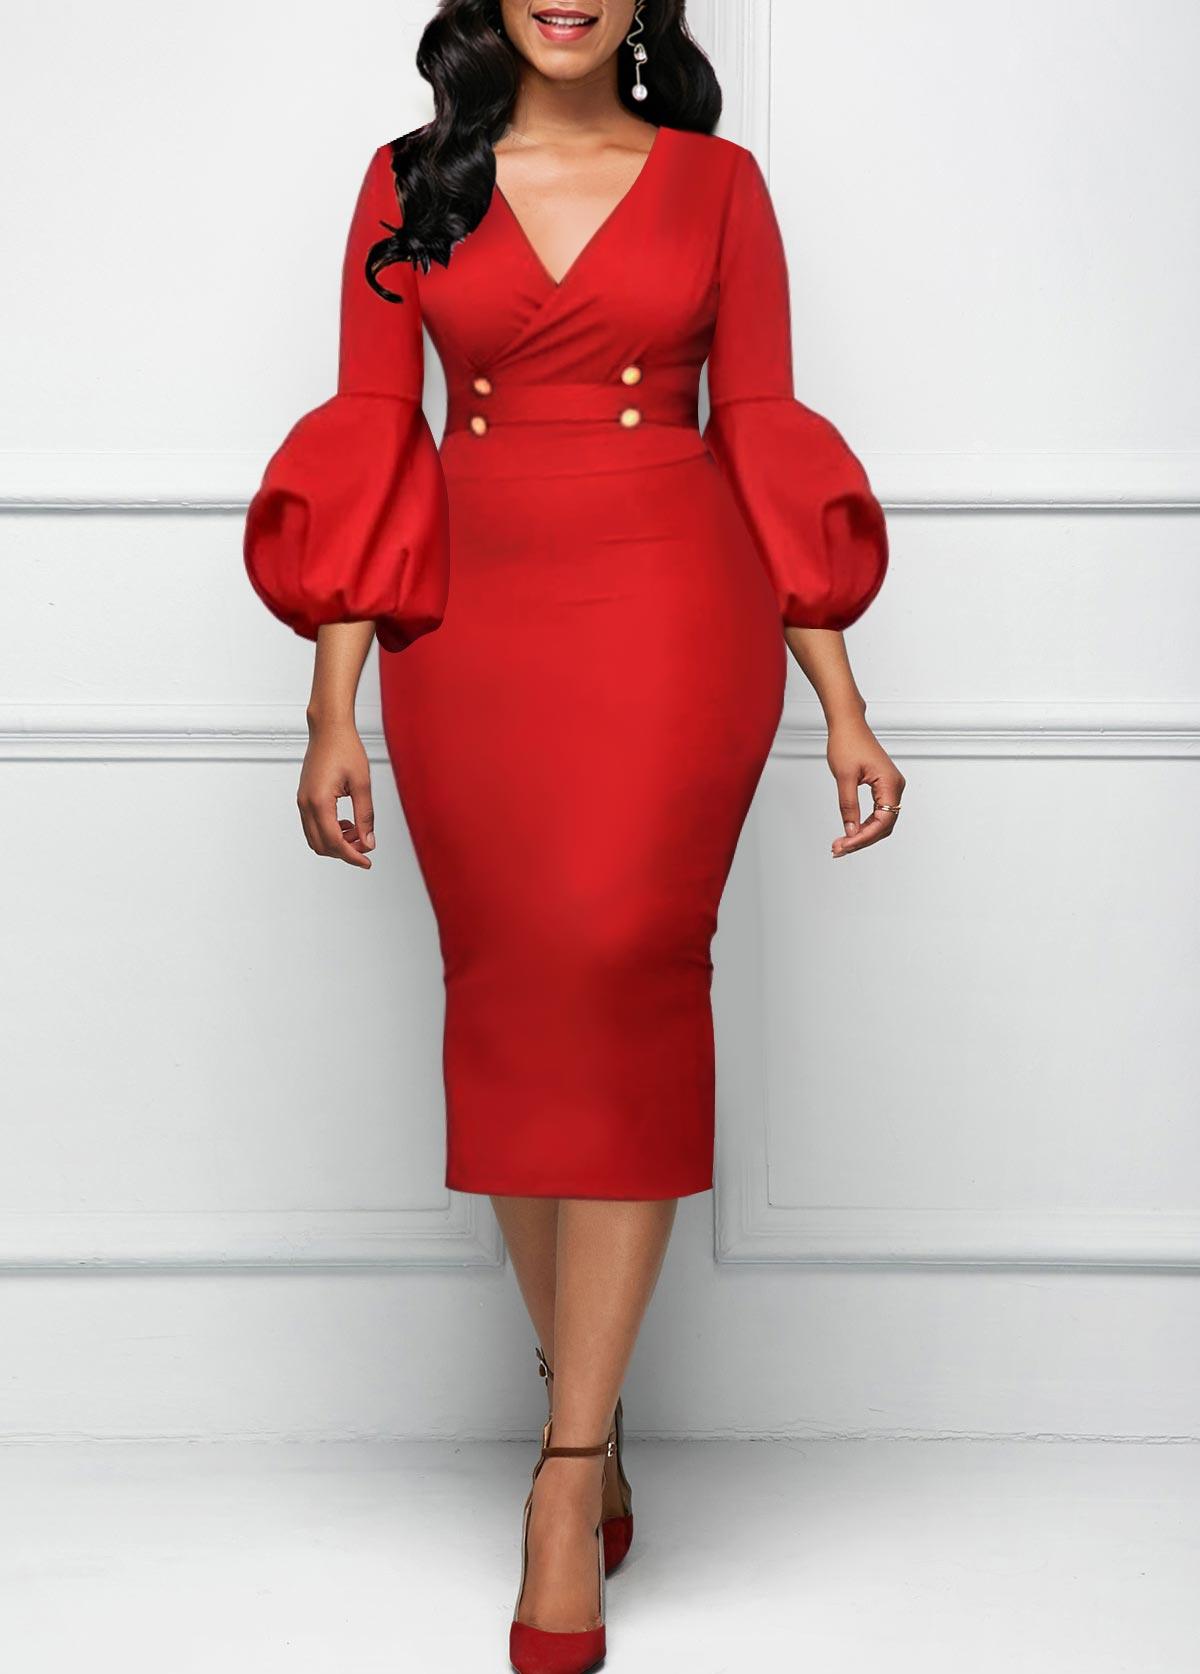 High Waist V Neck Red Dress